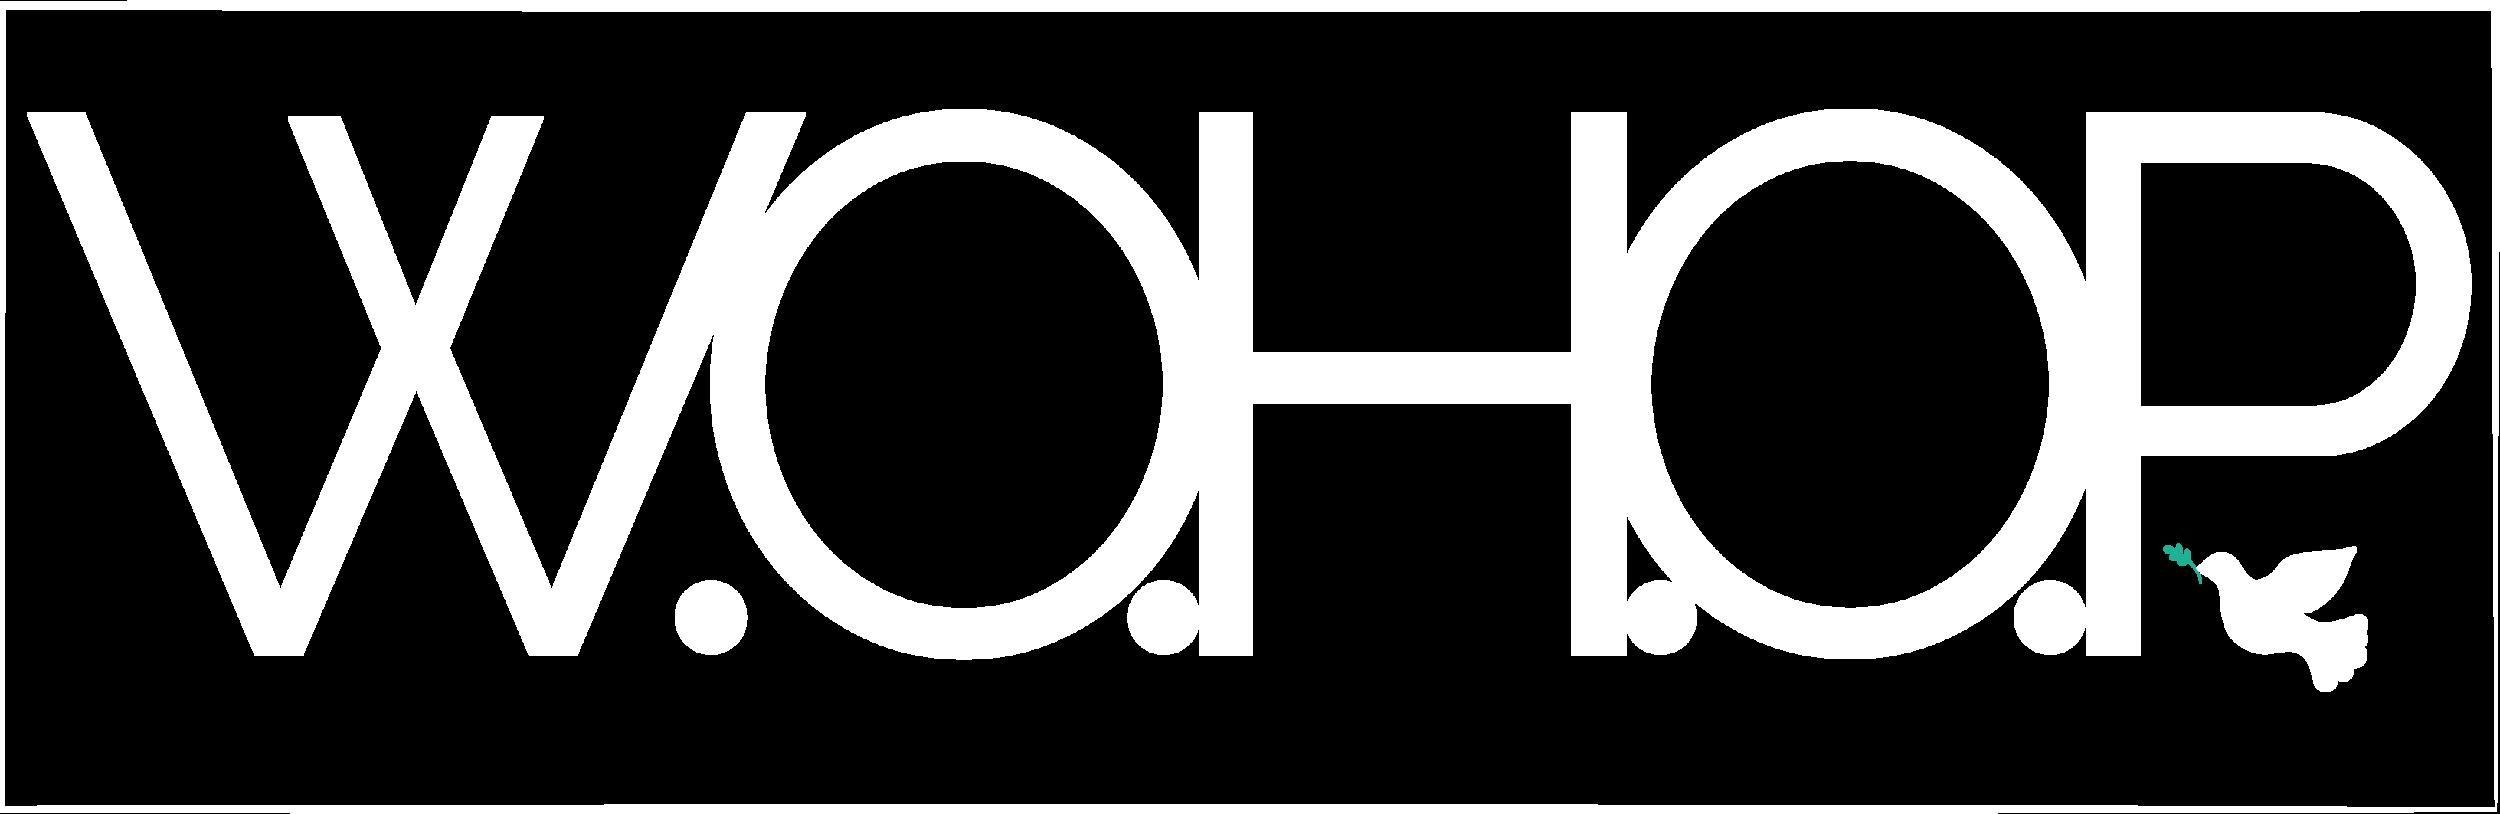 half logo white font.png